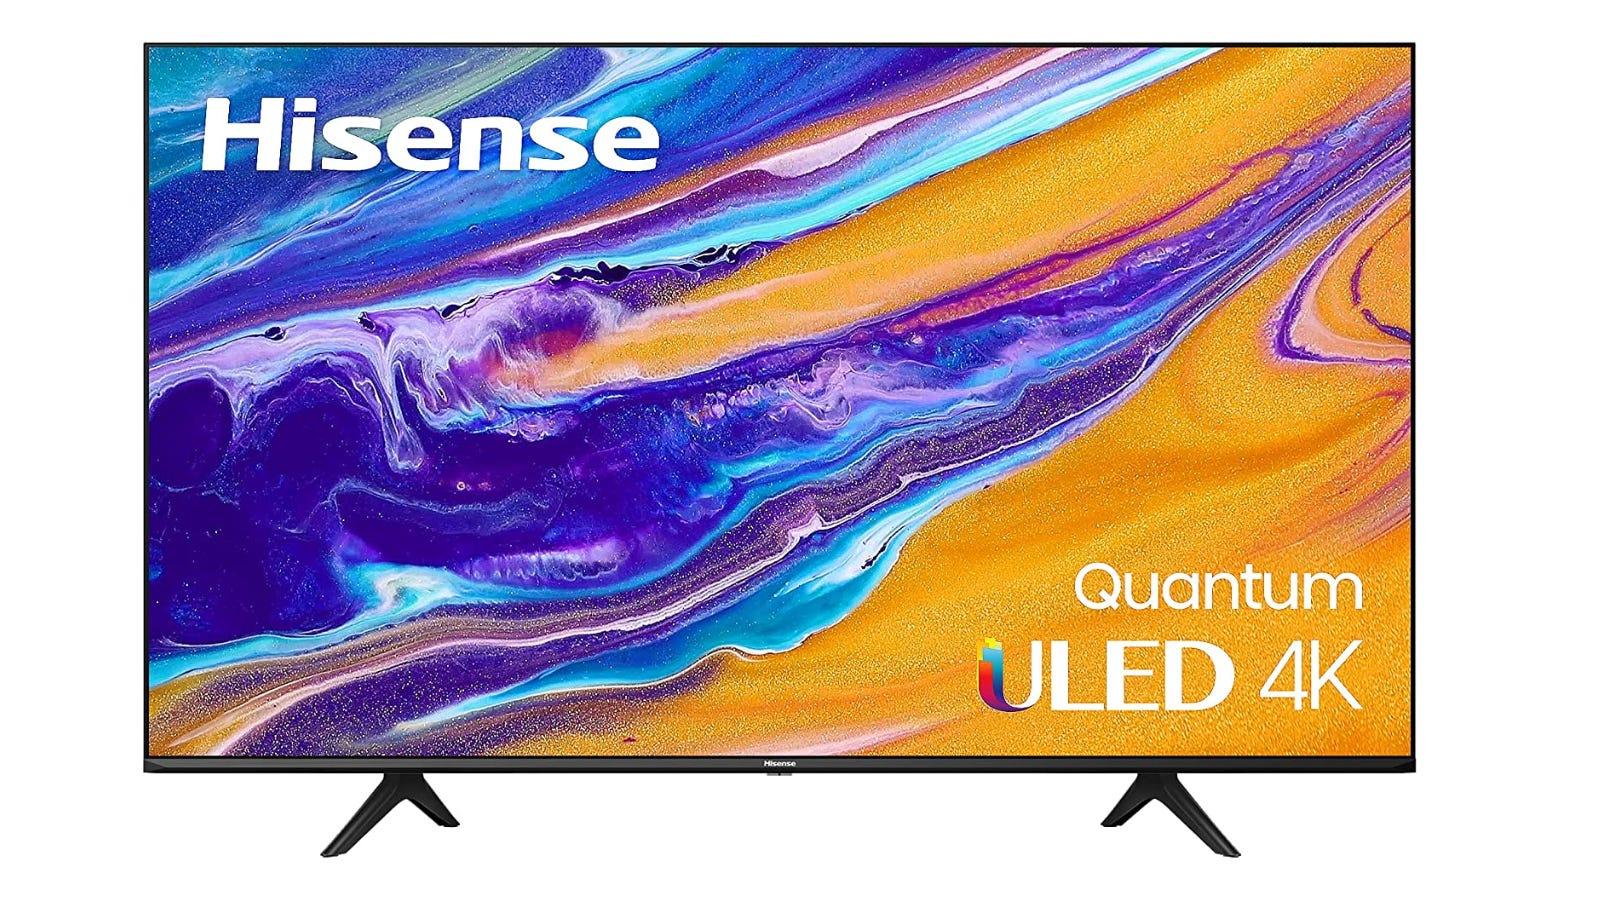 Hisense QLED Smart TV